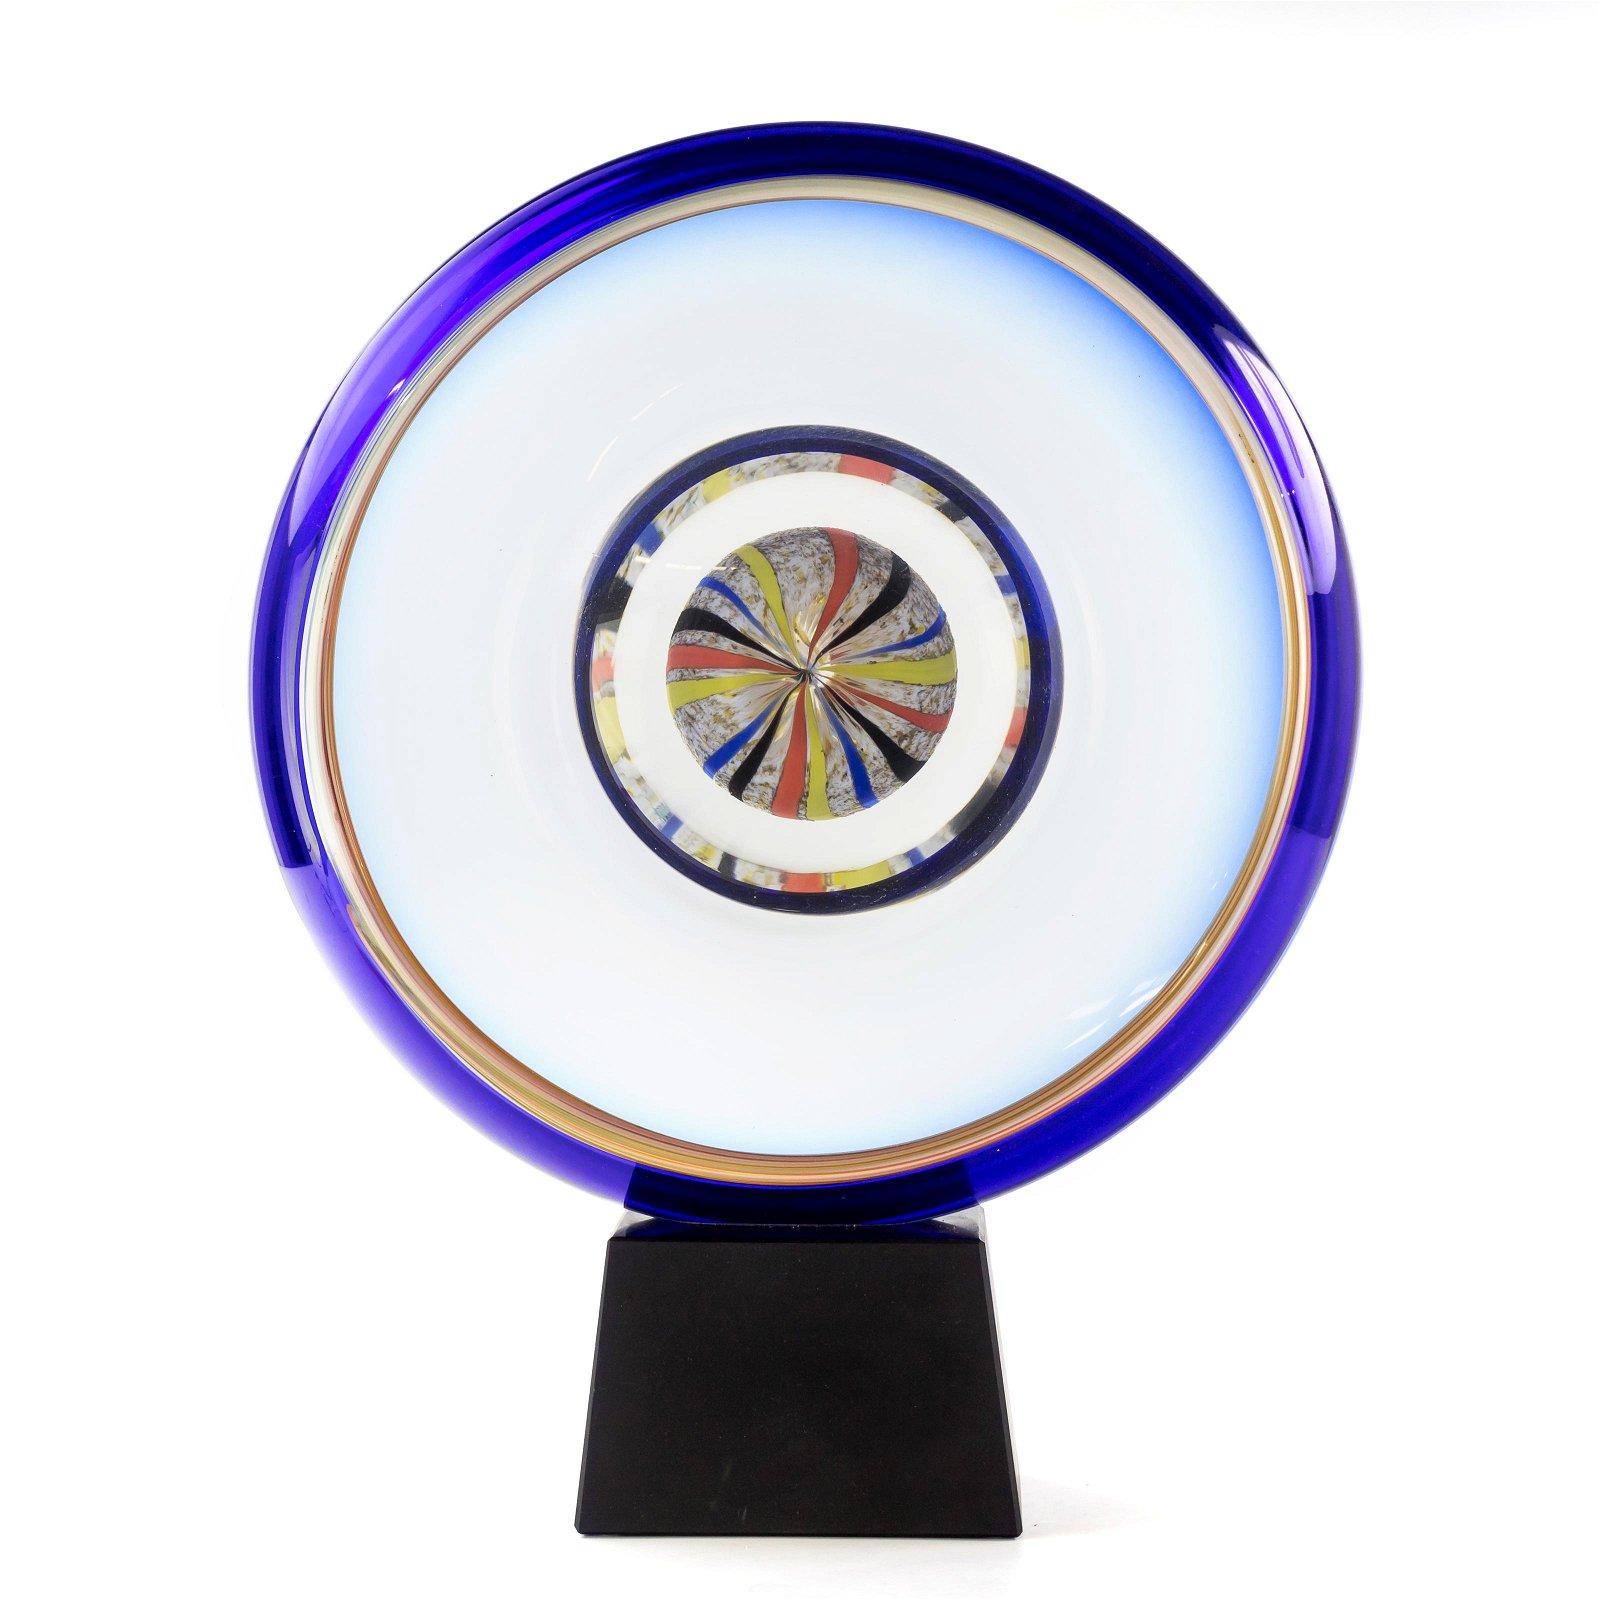 Stefano Toso Murano Italy Art Glass Disc Sculpture